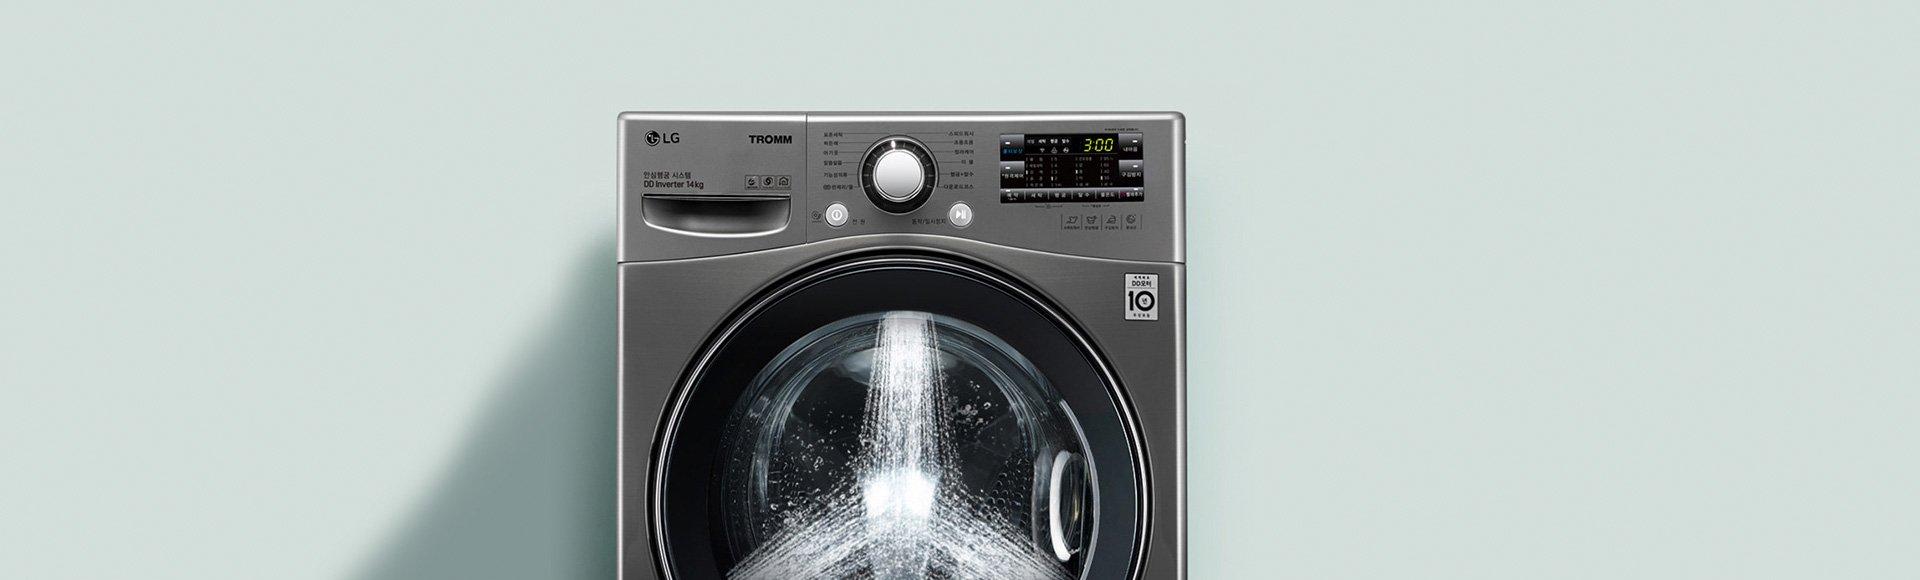 LG전자 S머니 적립 건조기 세탁기 세트모델 할인상품